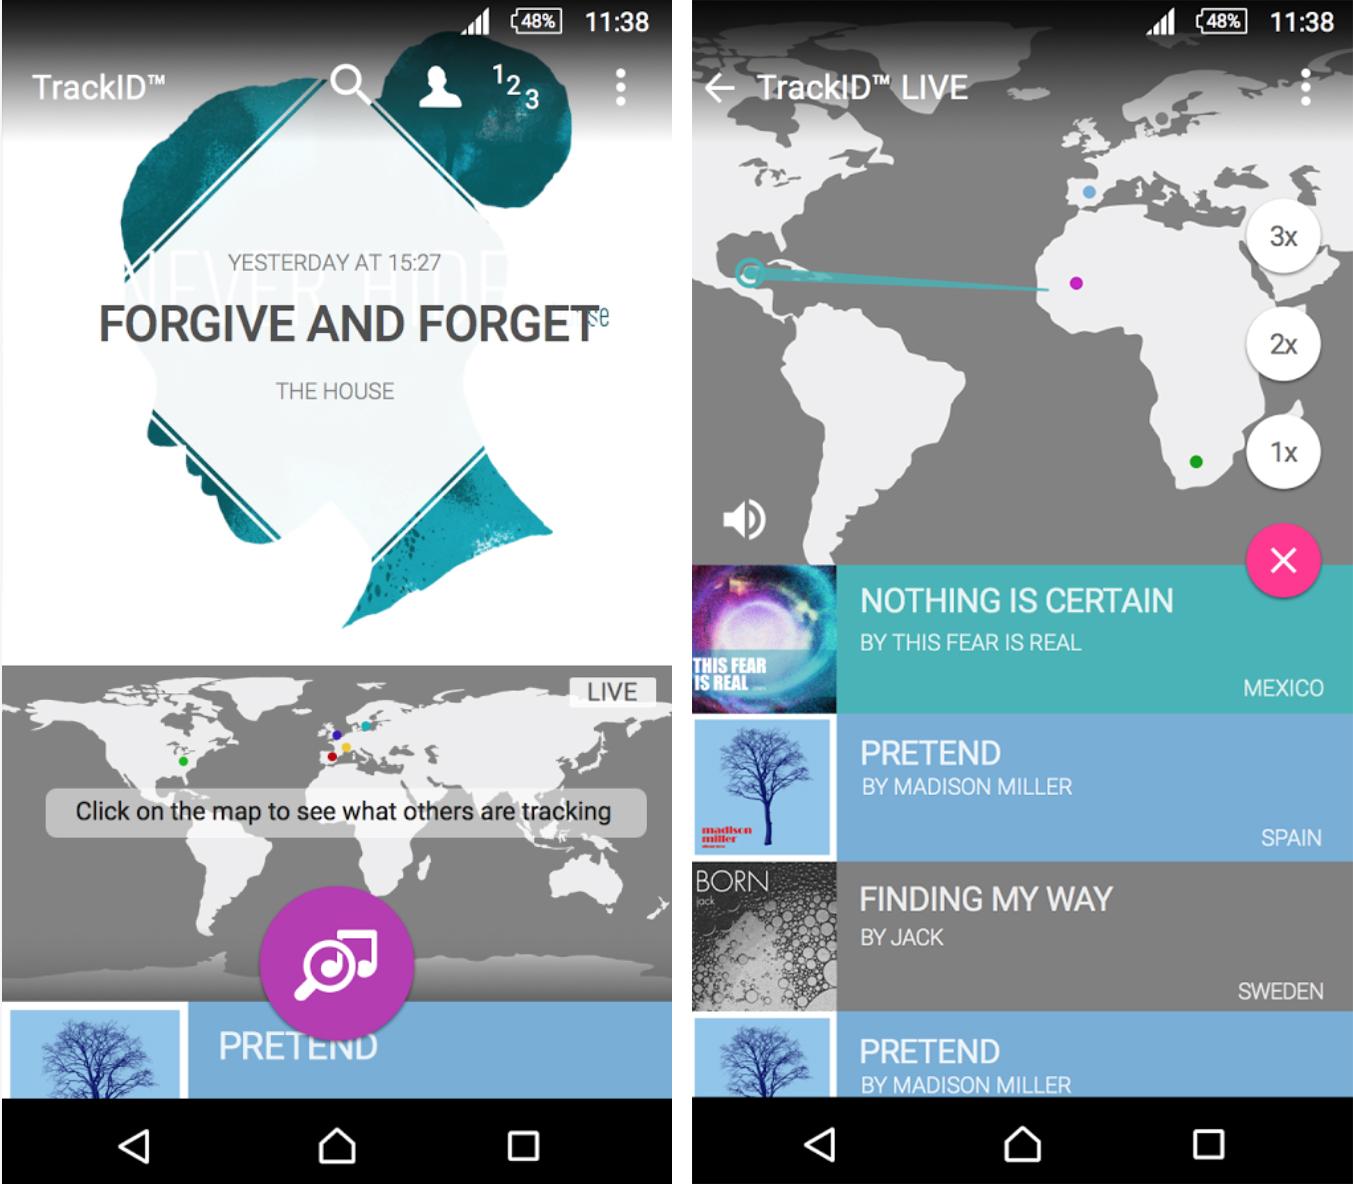 app track id